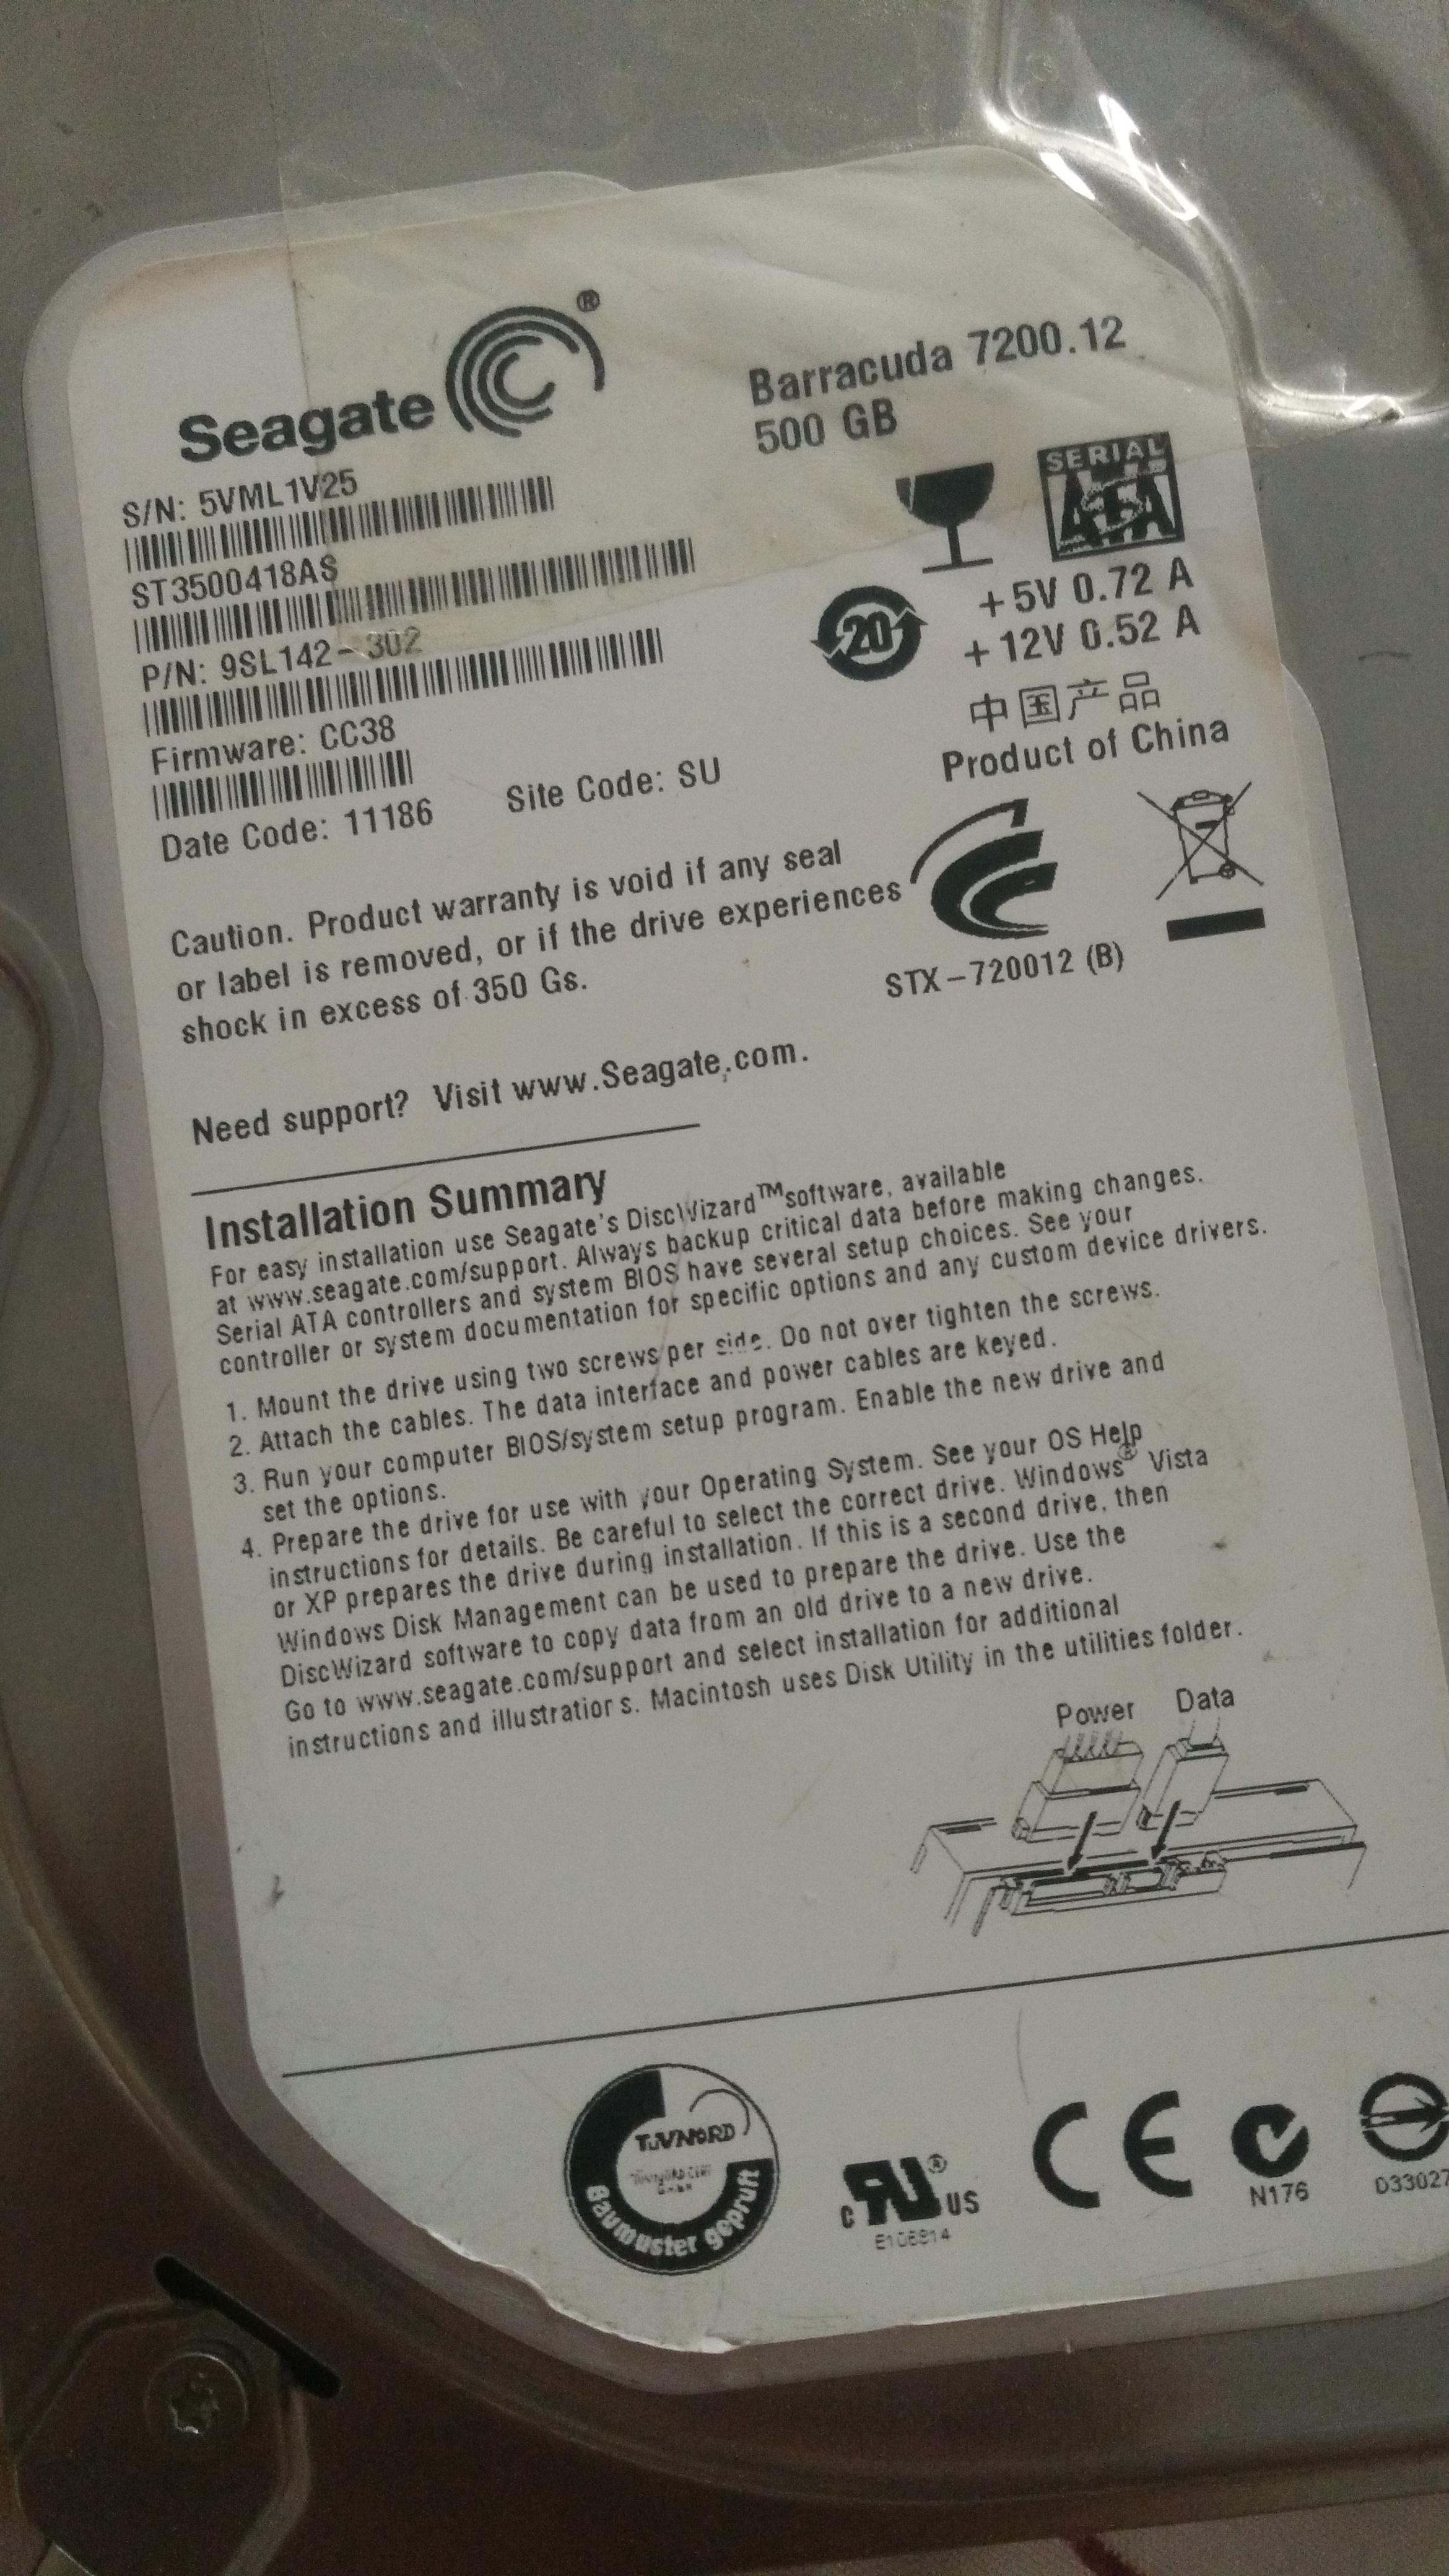 【Notes/经验】Seagate 7200.12 硬盘门故障修复过程简单记录